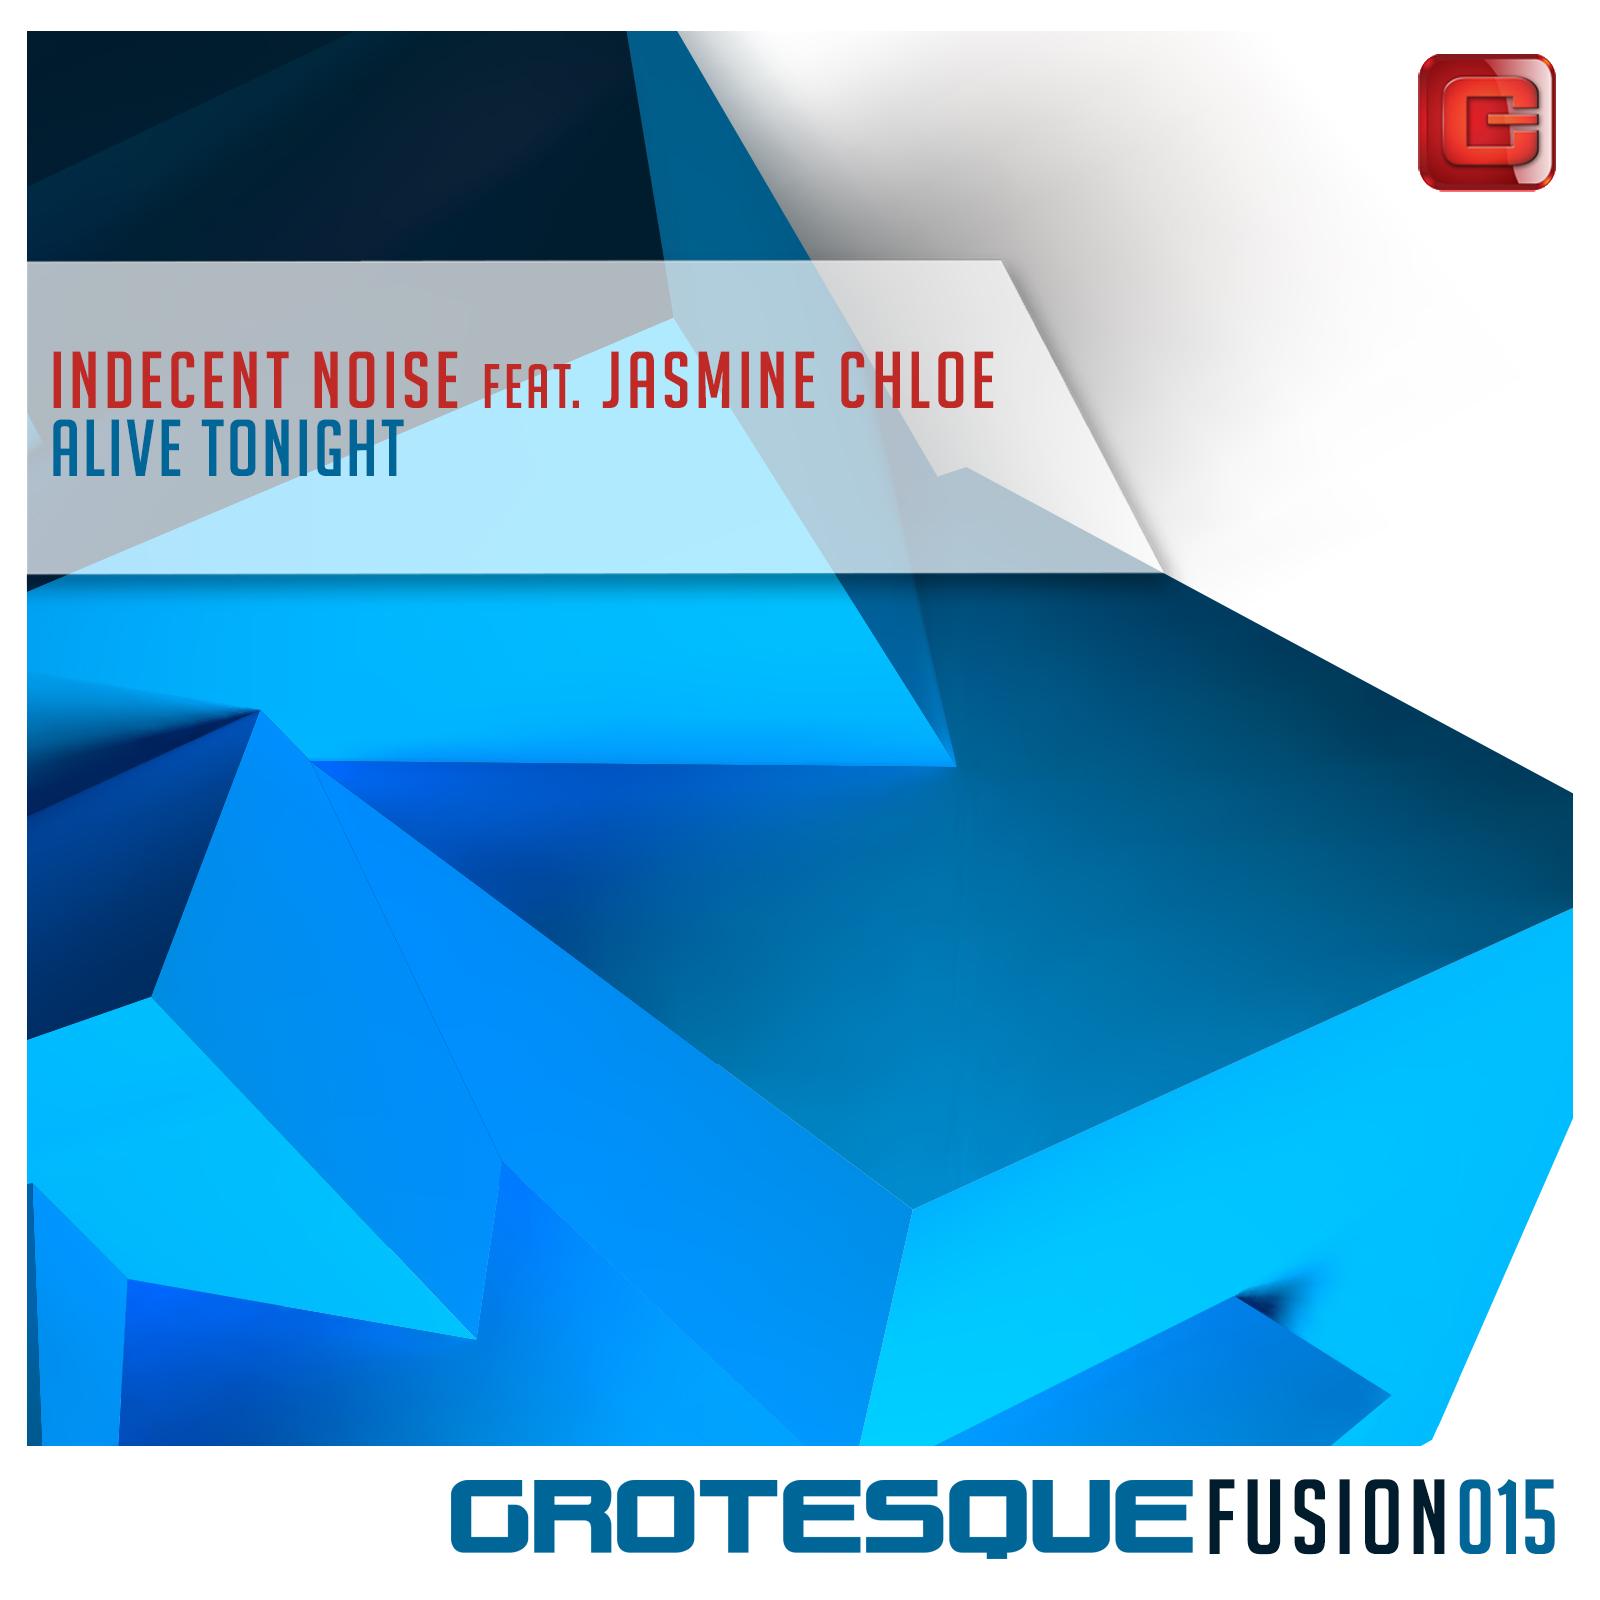 Indecent Noise feat. Jasmine Chloe - Alive Tonight